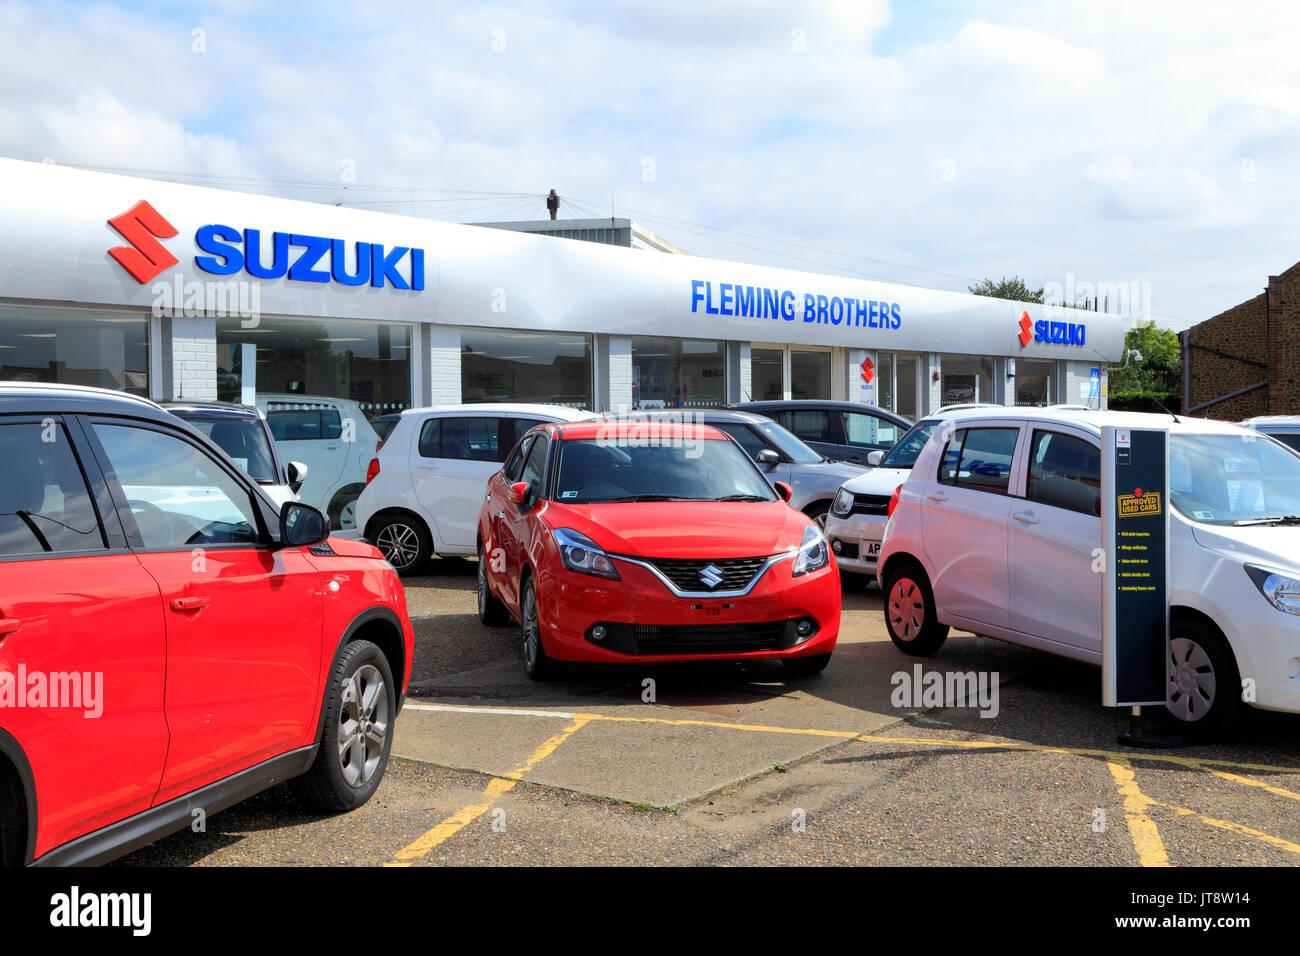 Suzuki Car Dealership >> C8 Alamy Com Comp Jt8w14 Suzuki Car Dealers Main D